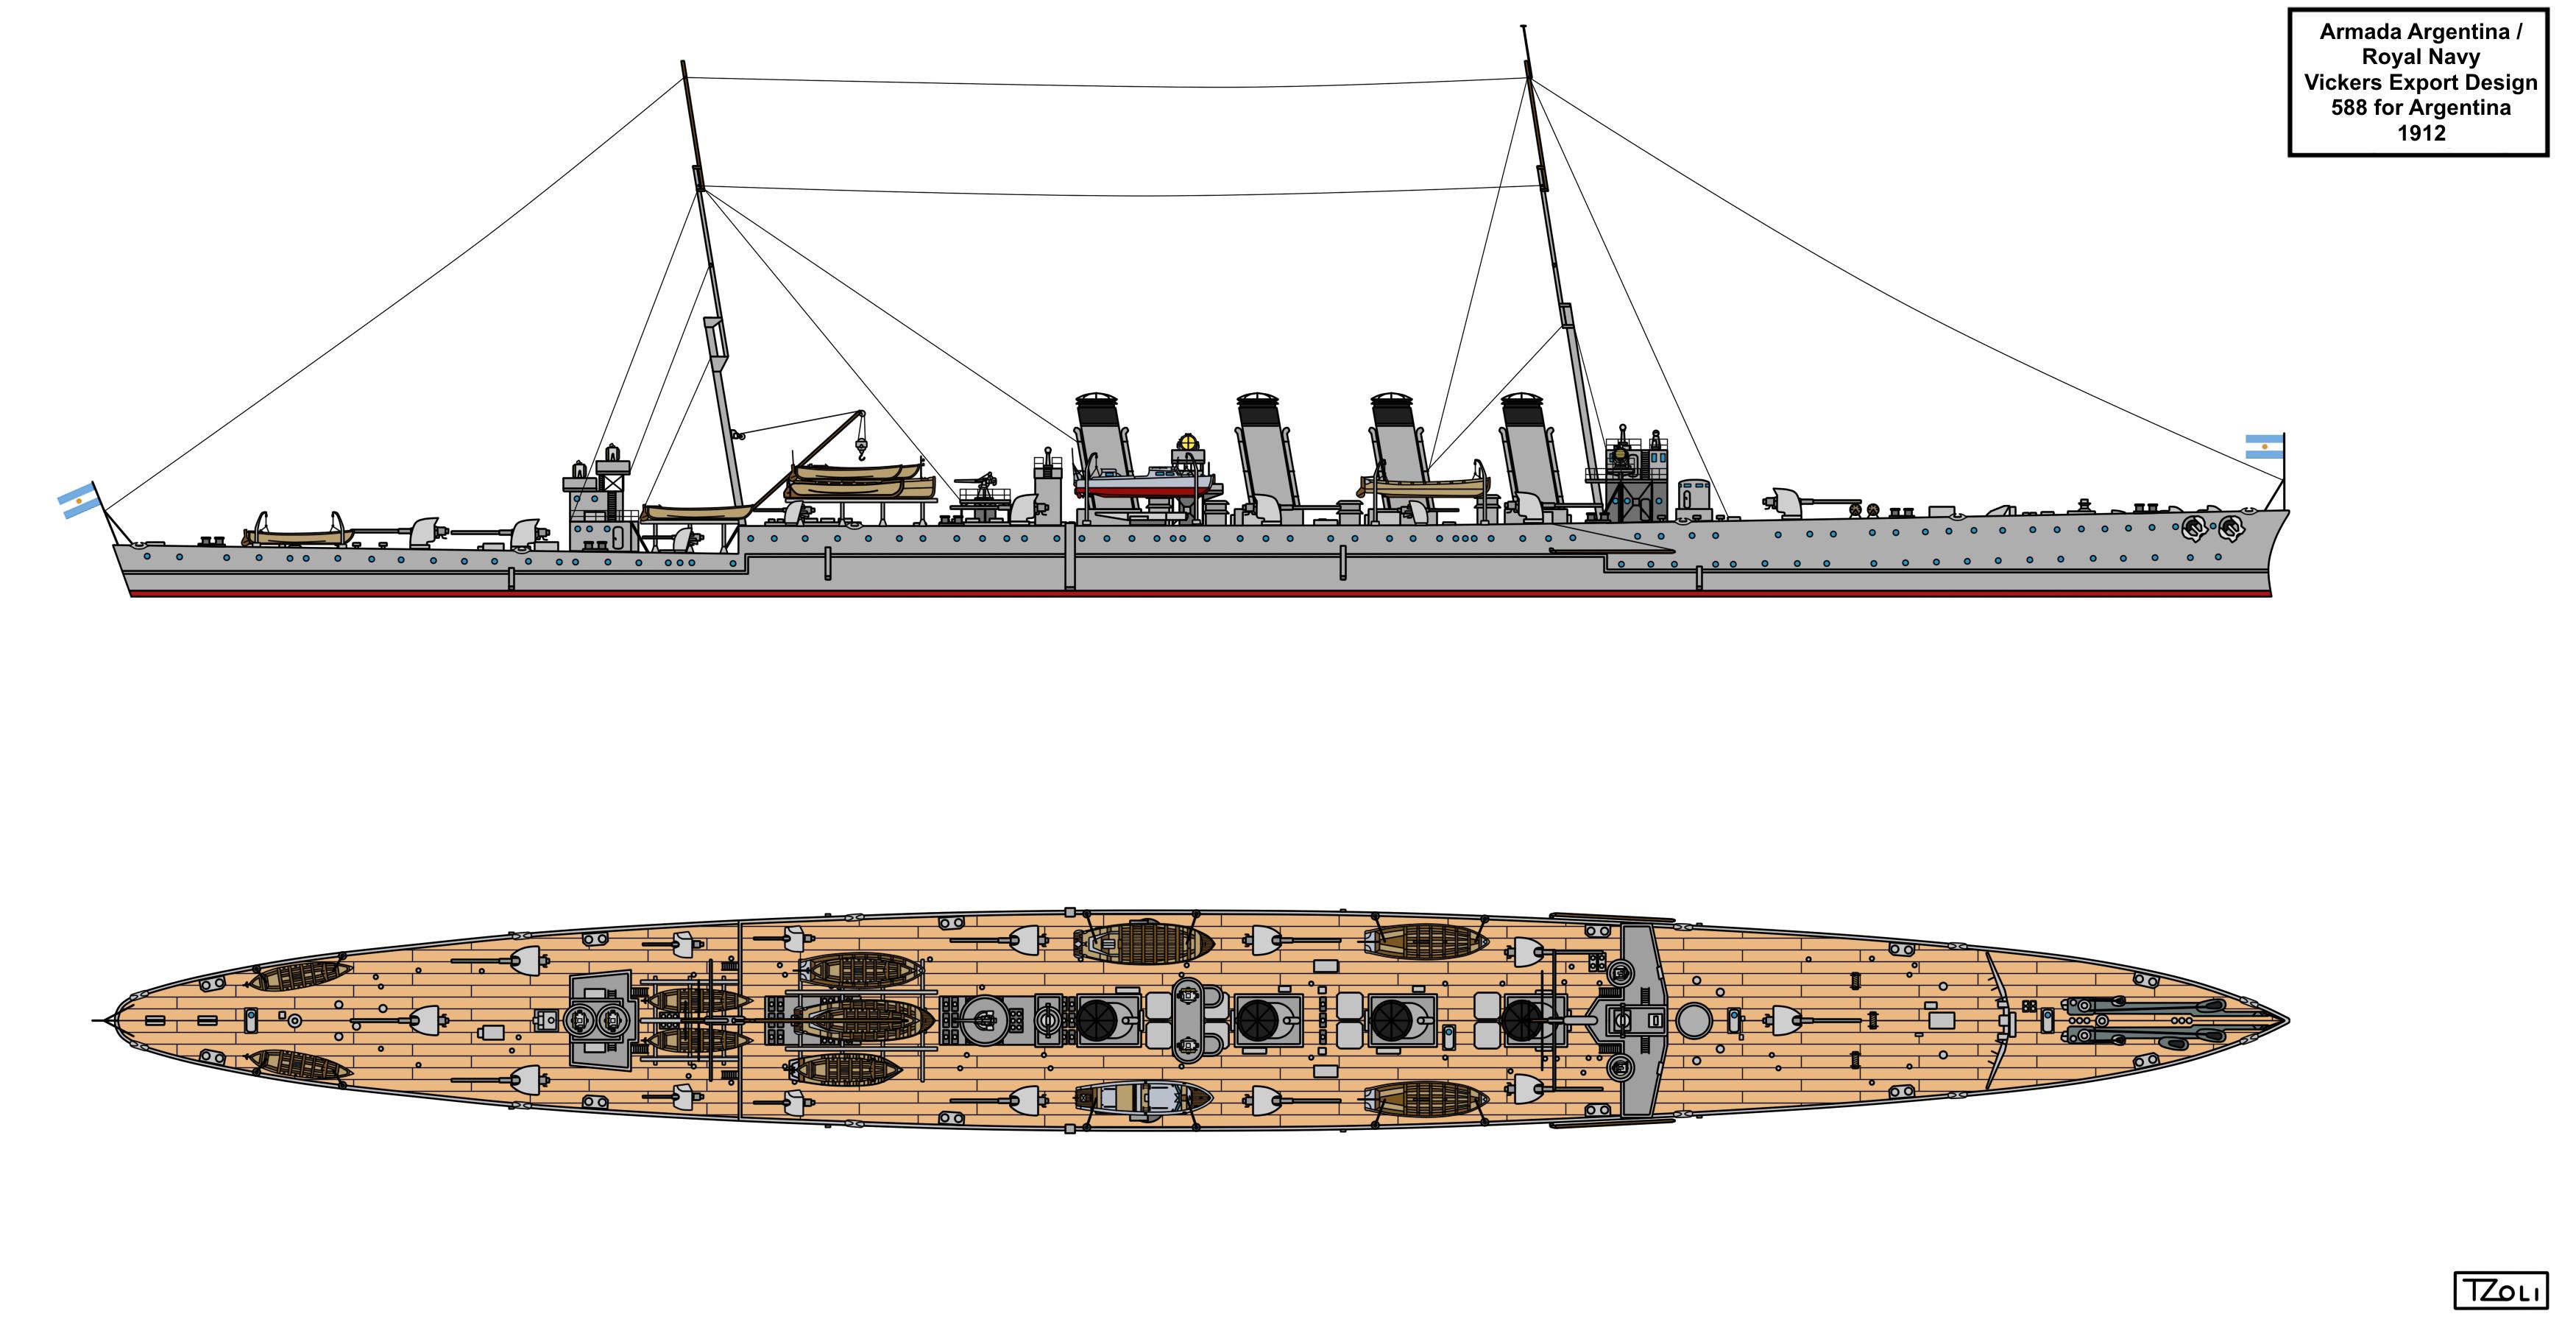 Vickers Design 588